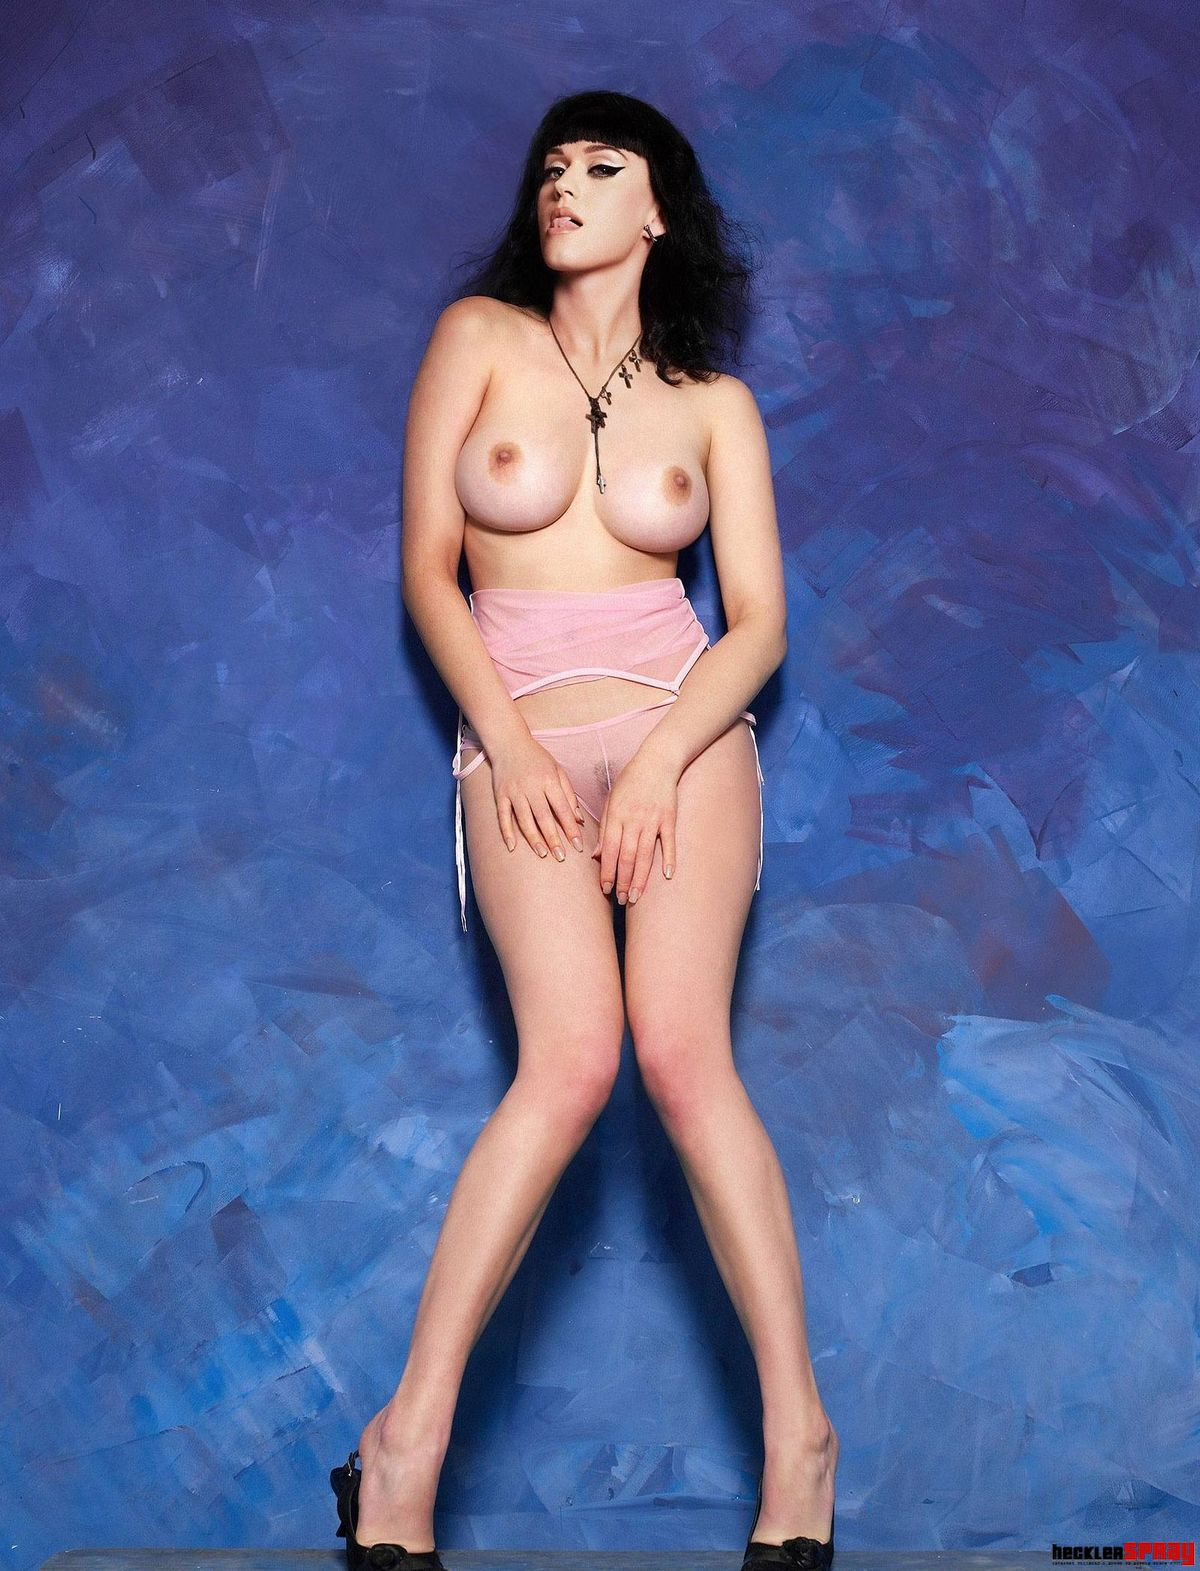 lisa arturo naked ass